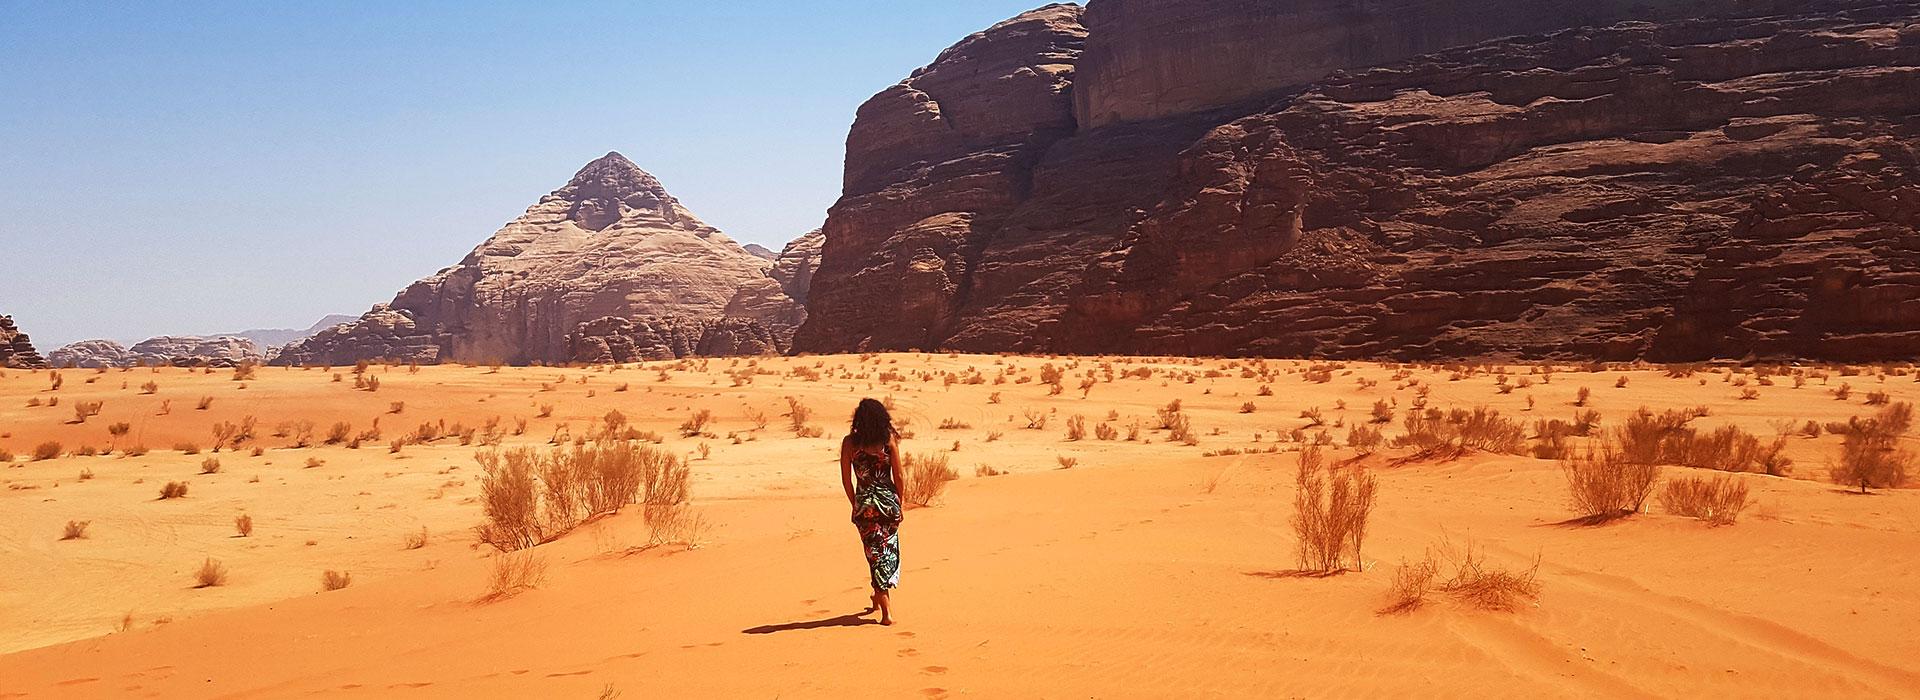 senstations-voyage-accueil-blog-voyage-jordanie-wadi-rumsenstations-voyage-accueil-blog-voyage-jordanie-wadi-rum